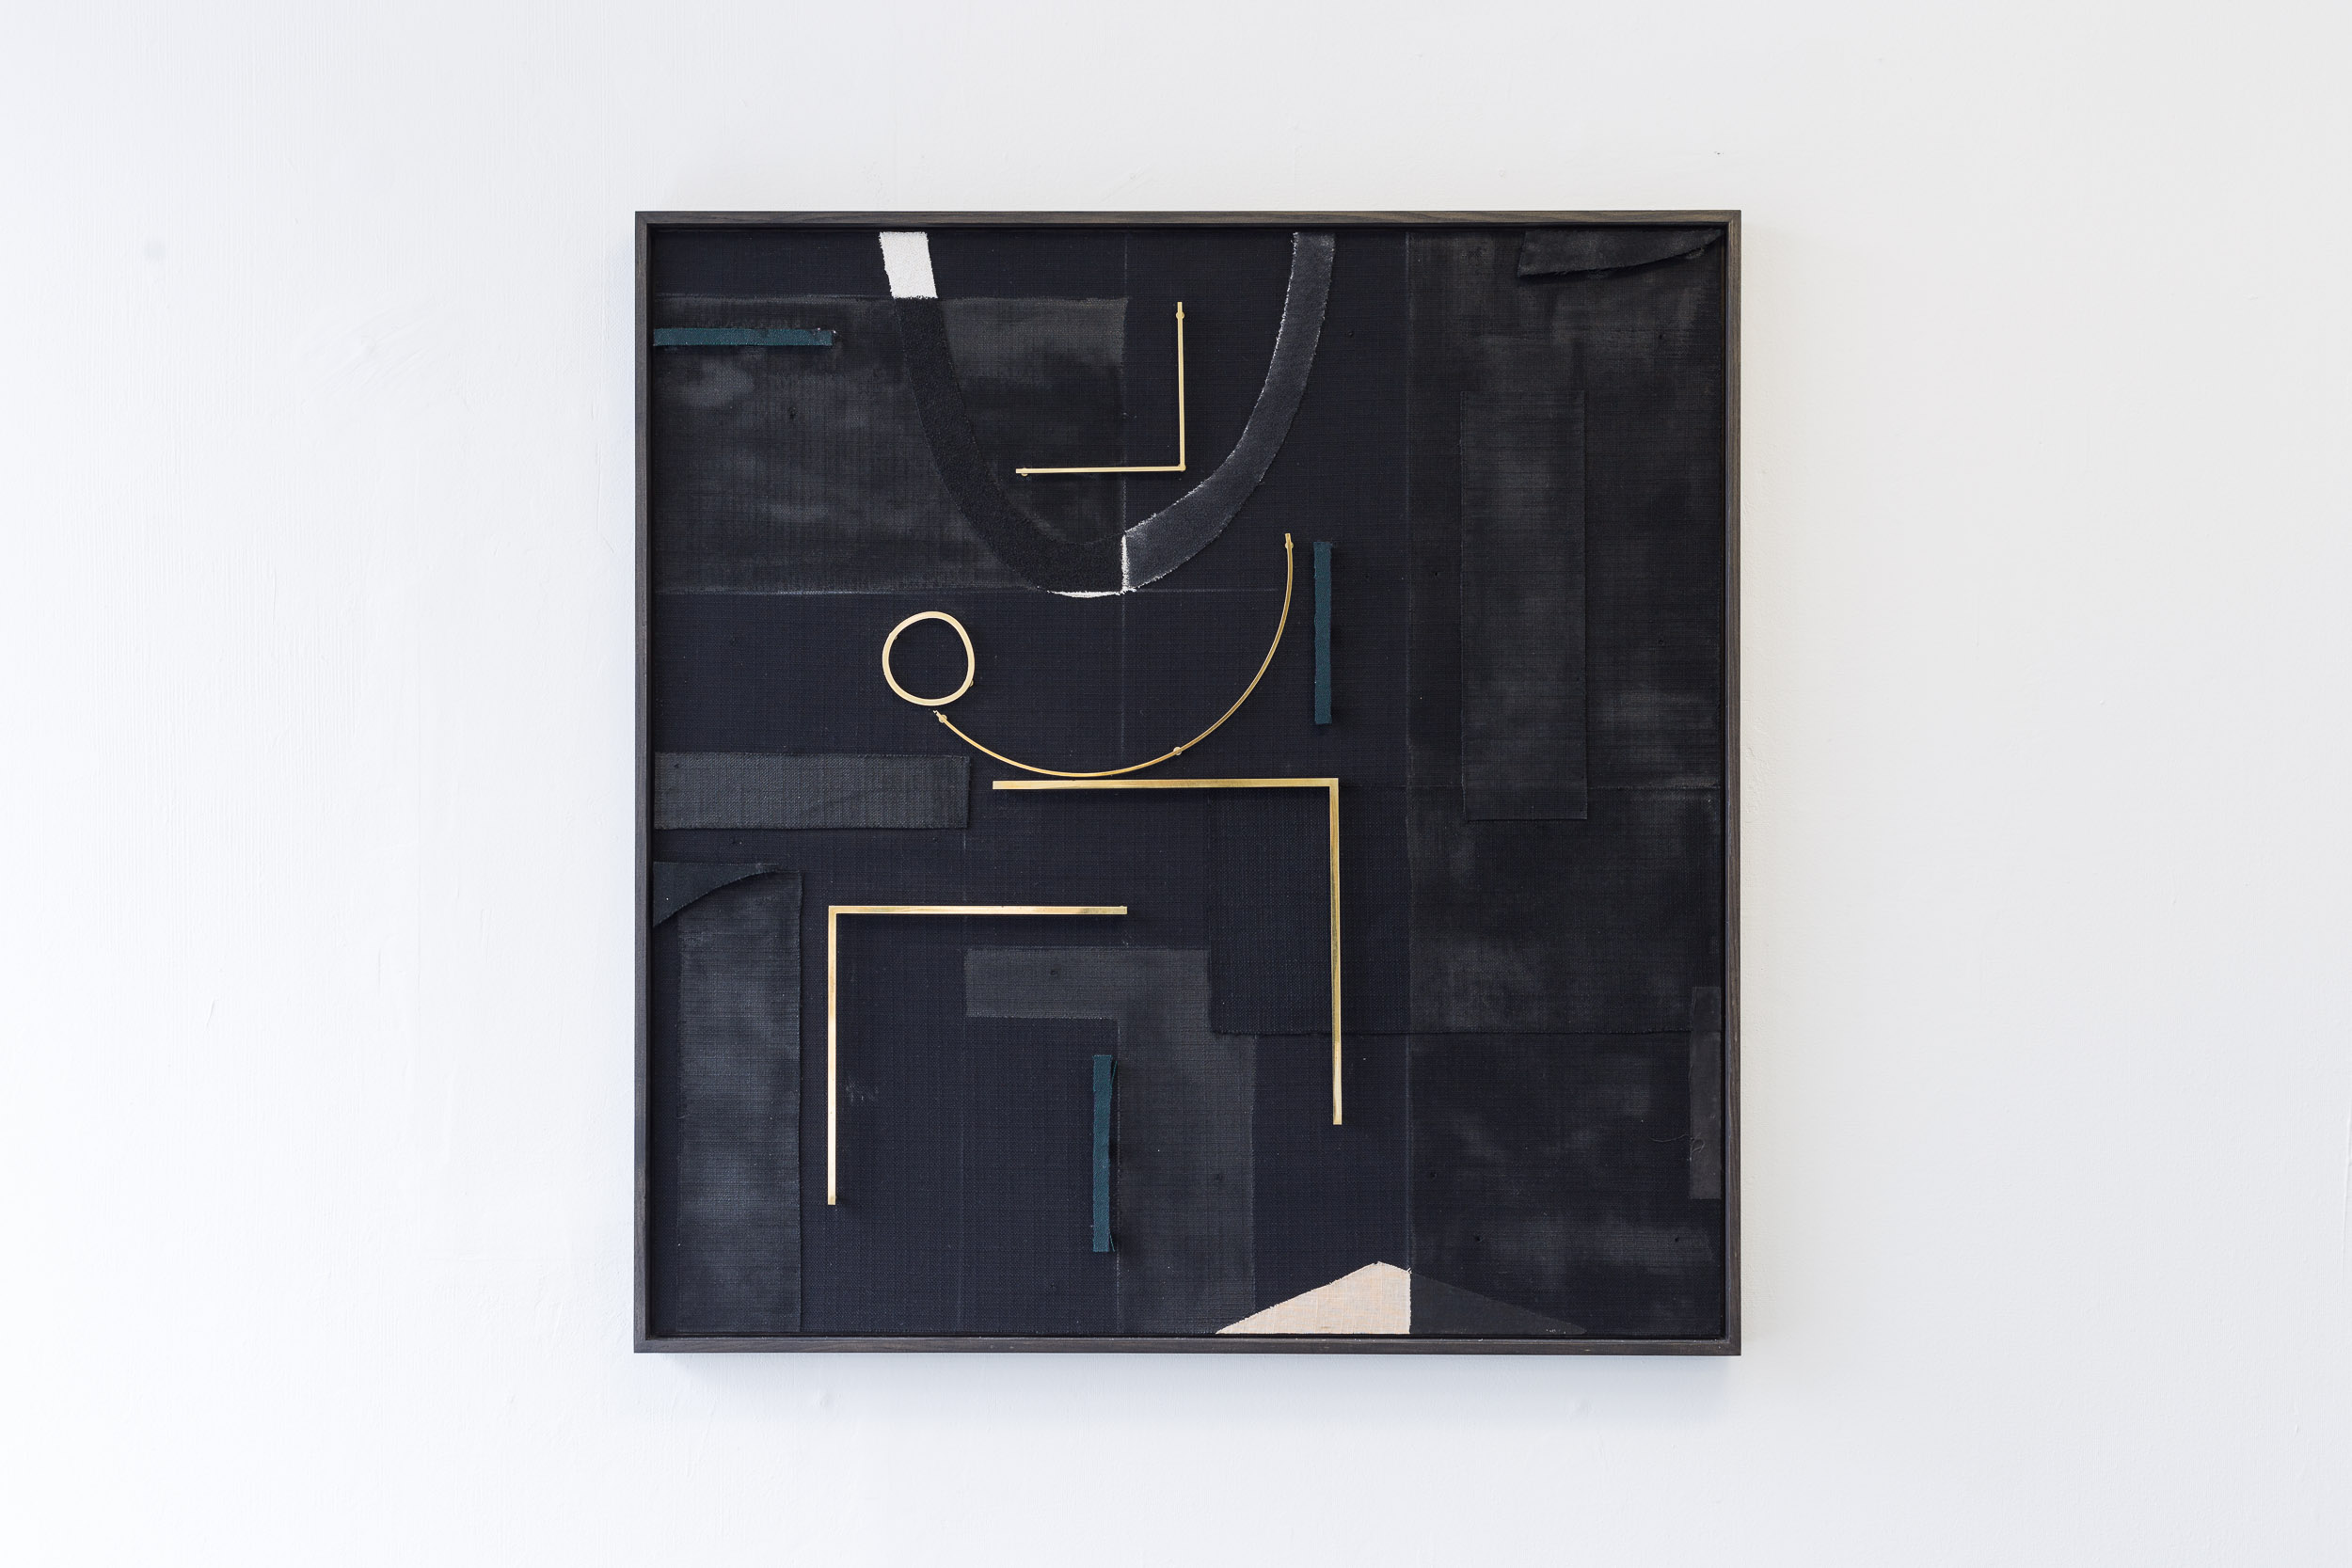 Kirstine Roepstorff,  Playful Moon , 2017, Collage: brass, fabric, 146 x 146 cm   Photo: Kilian Bannwart